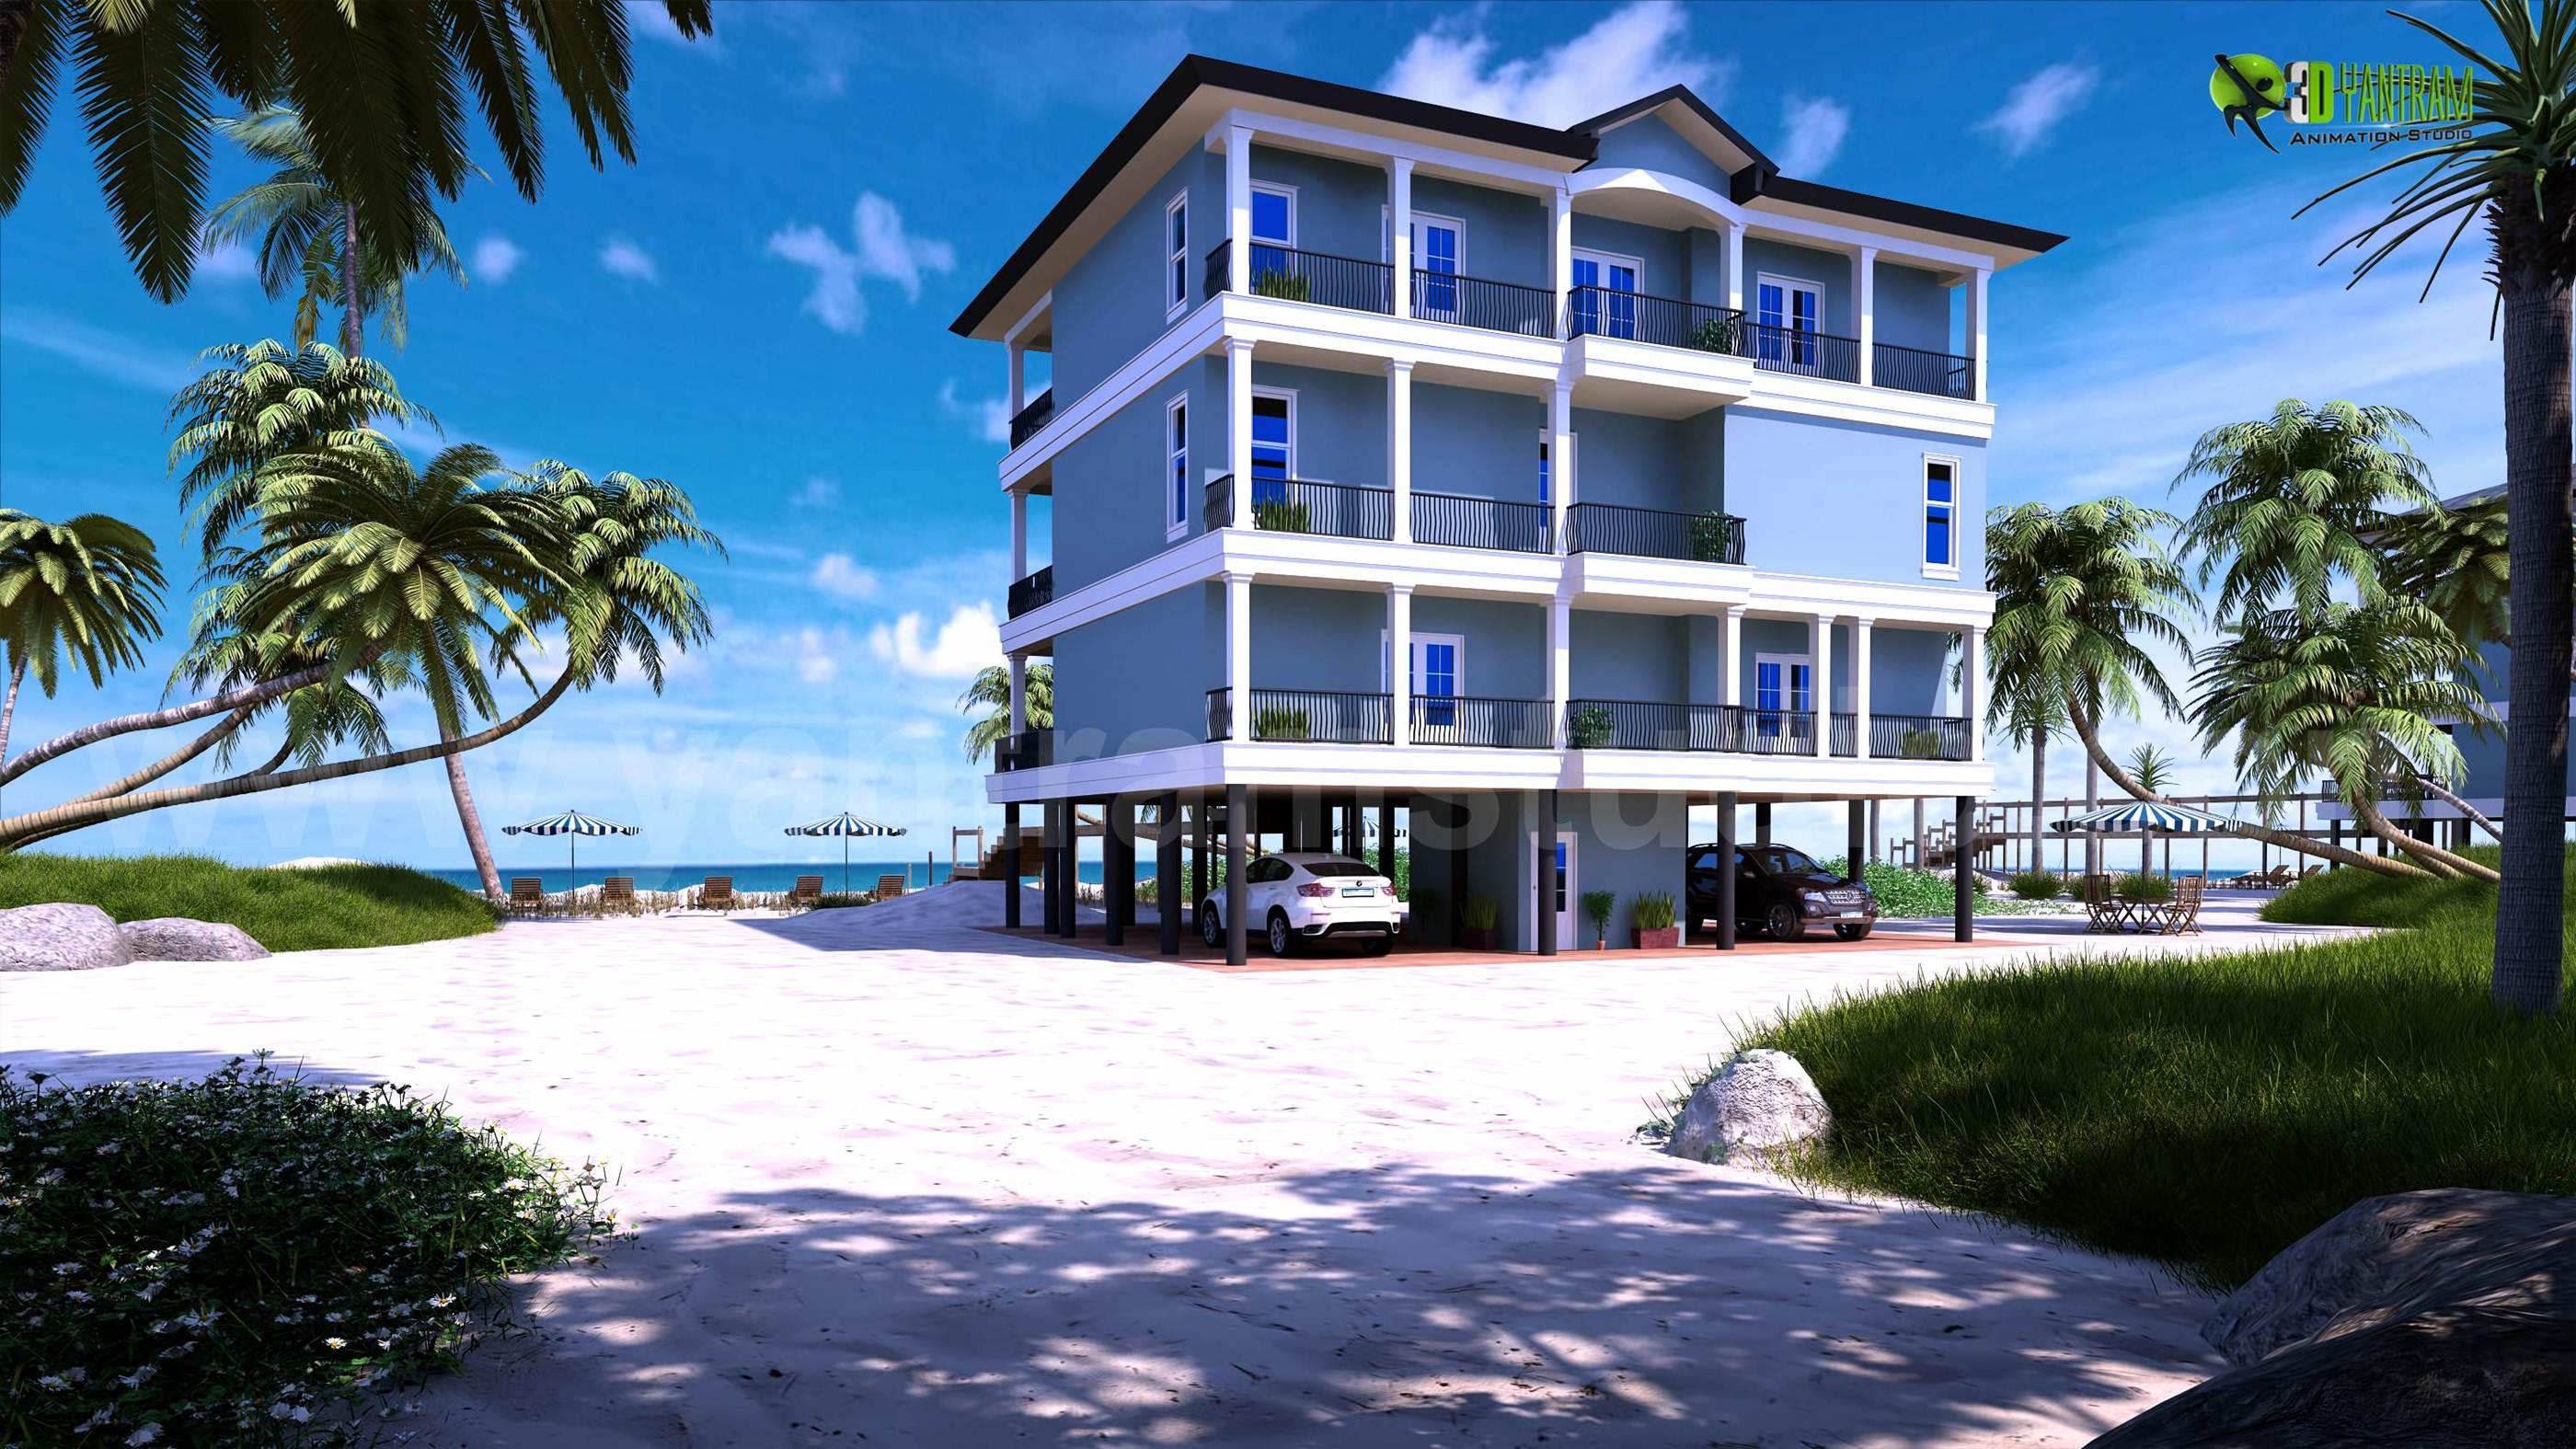 beach house exterior design rendering animation yantramstudio rh foundmyself com House Plan Rendering Beach House Lighting